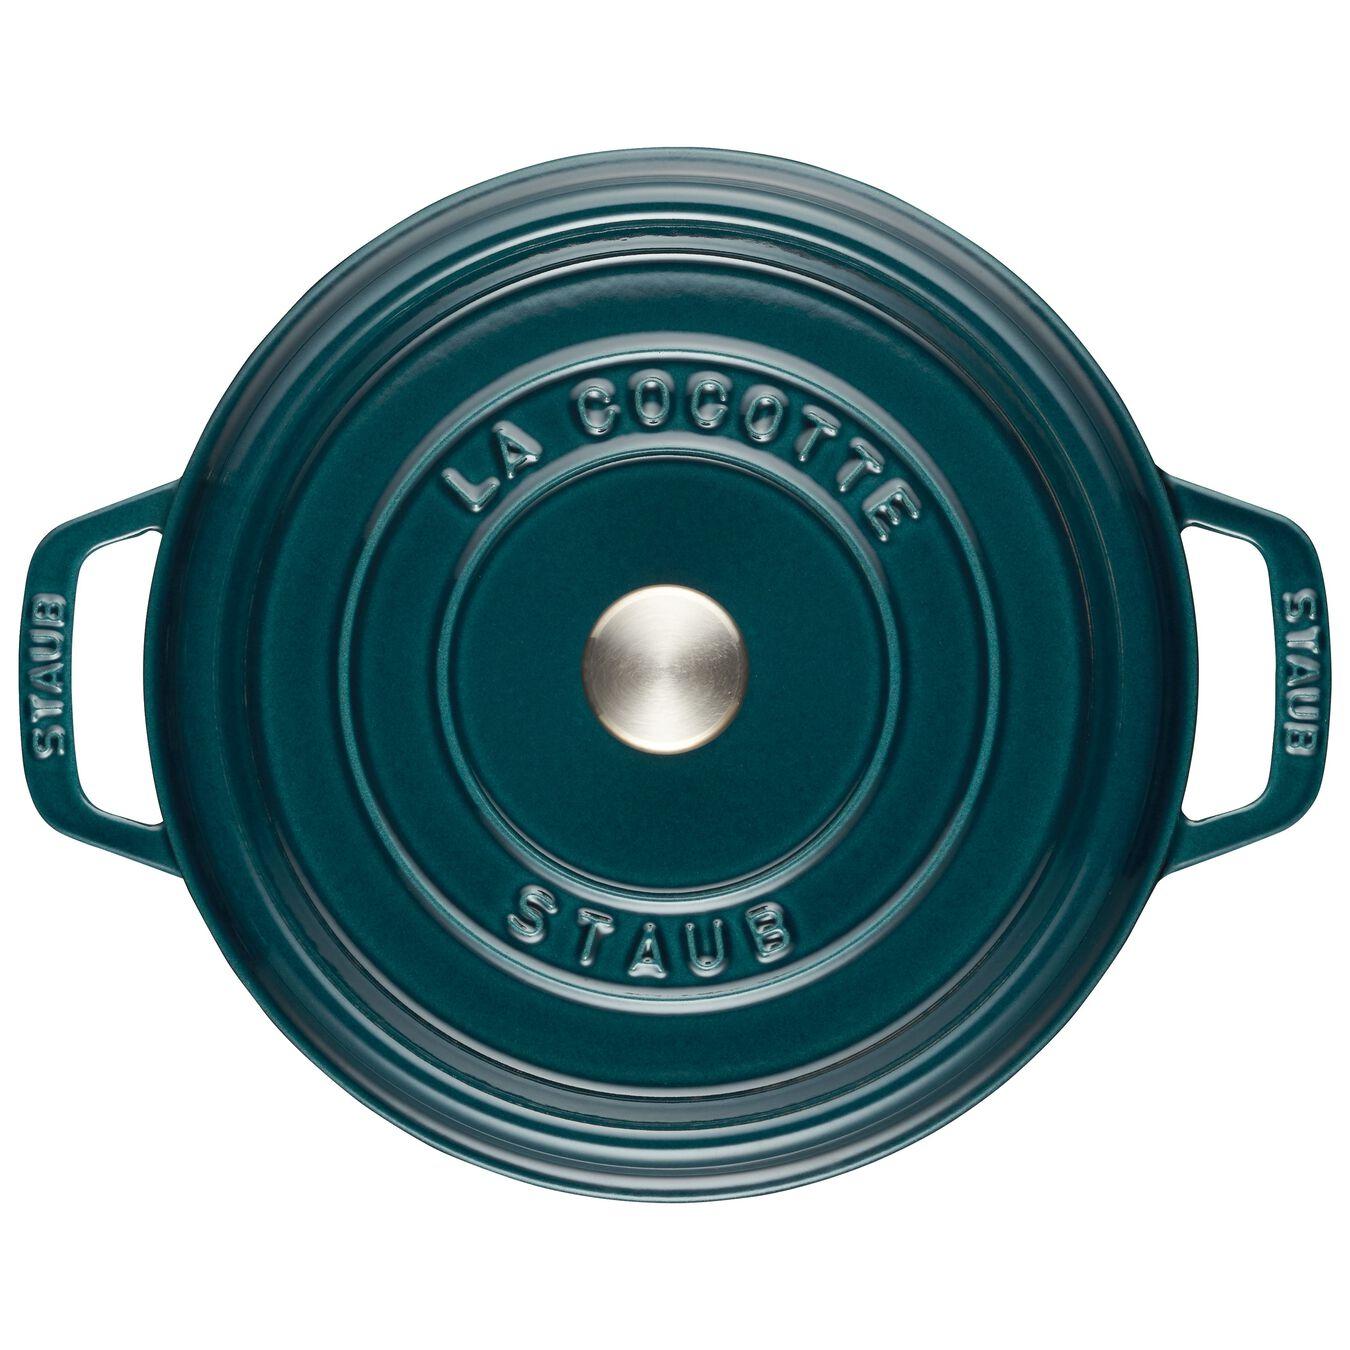 Döküm Tencere | Döküm Demir | 3,8 l | Akdeniz Mavisi,,large 2